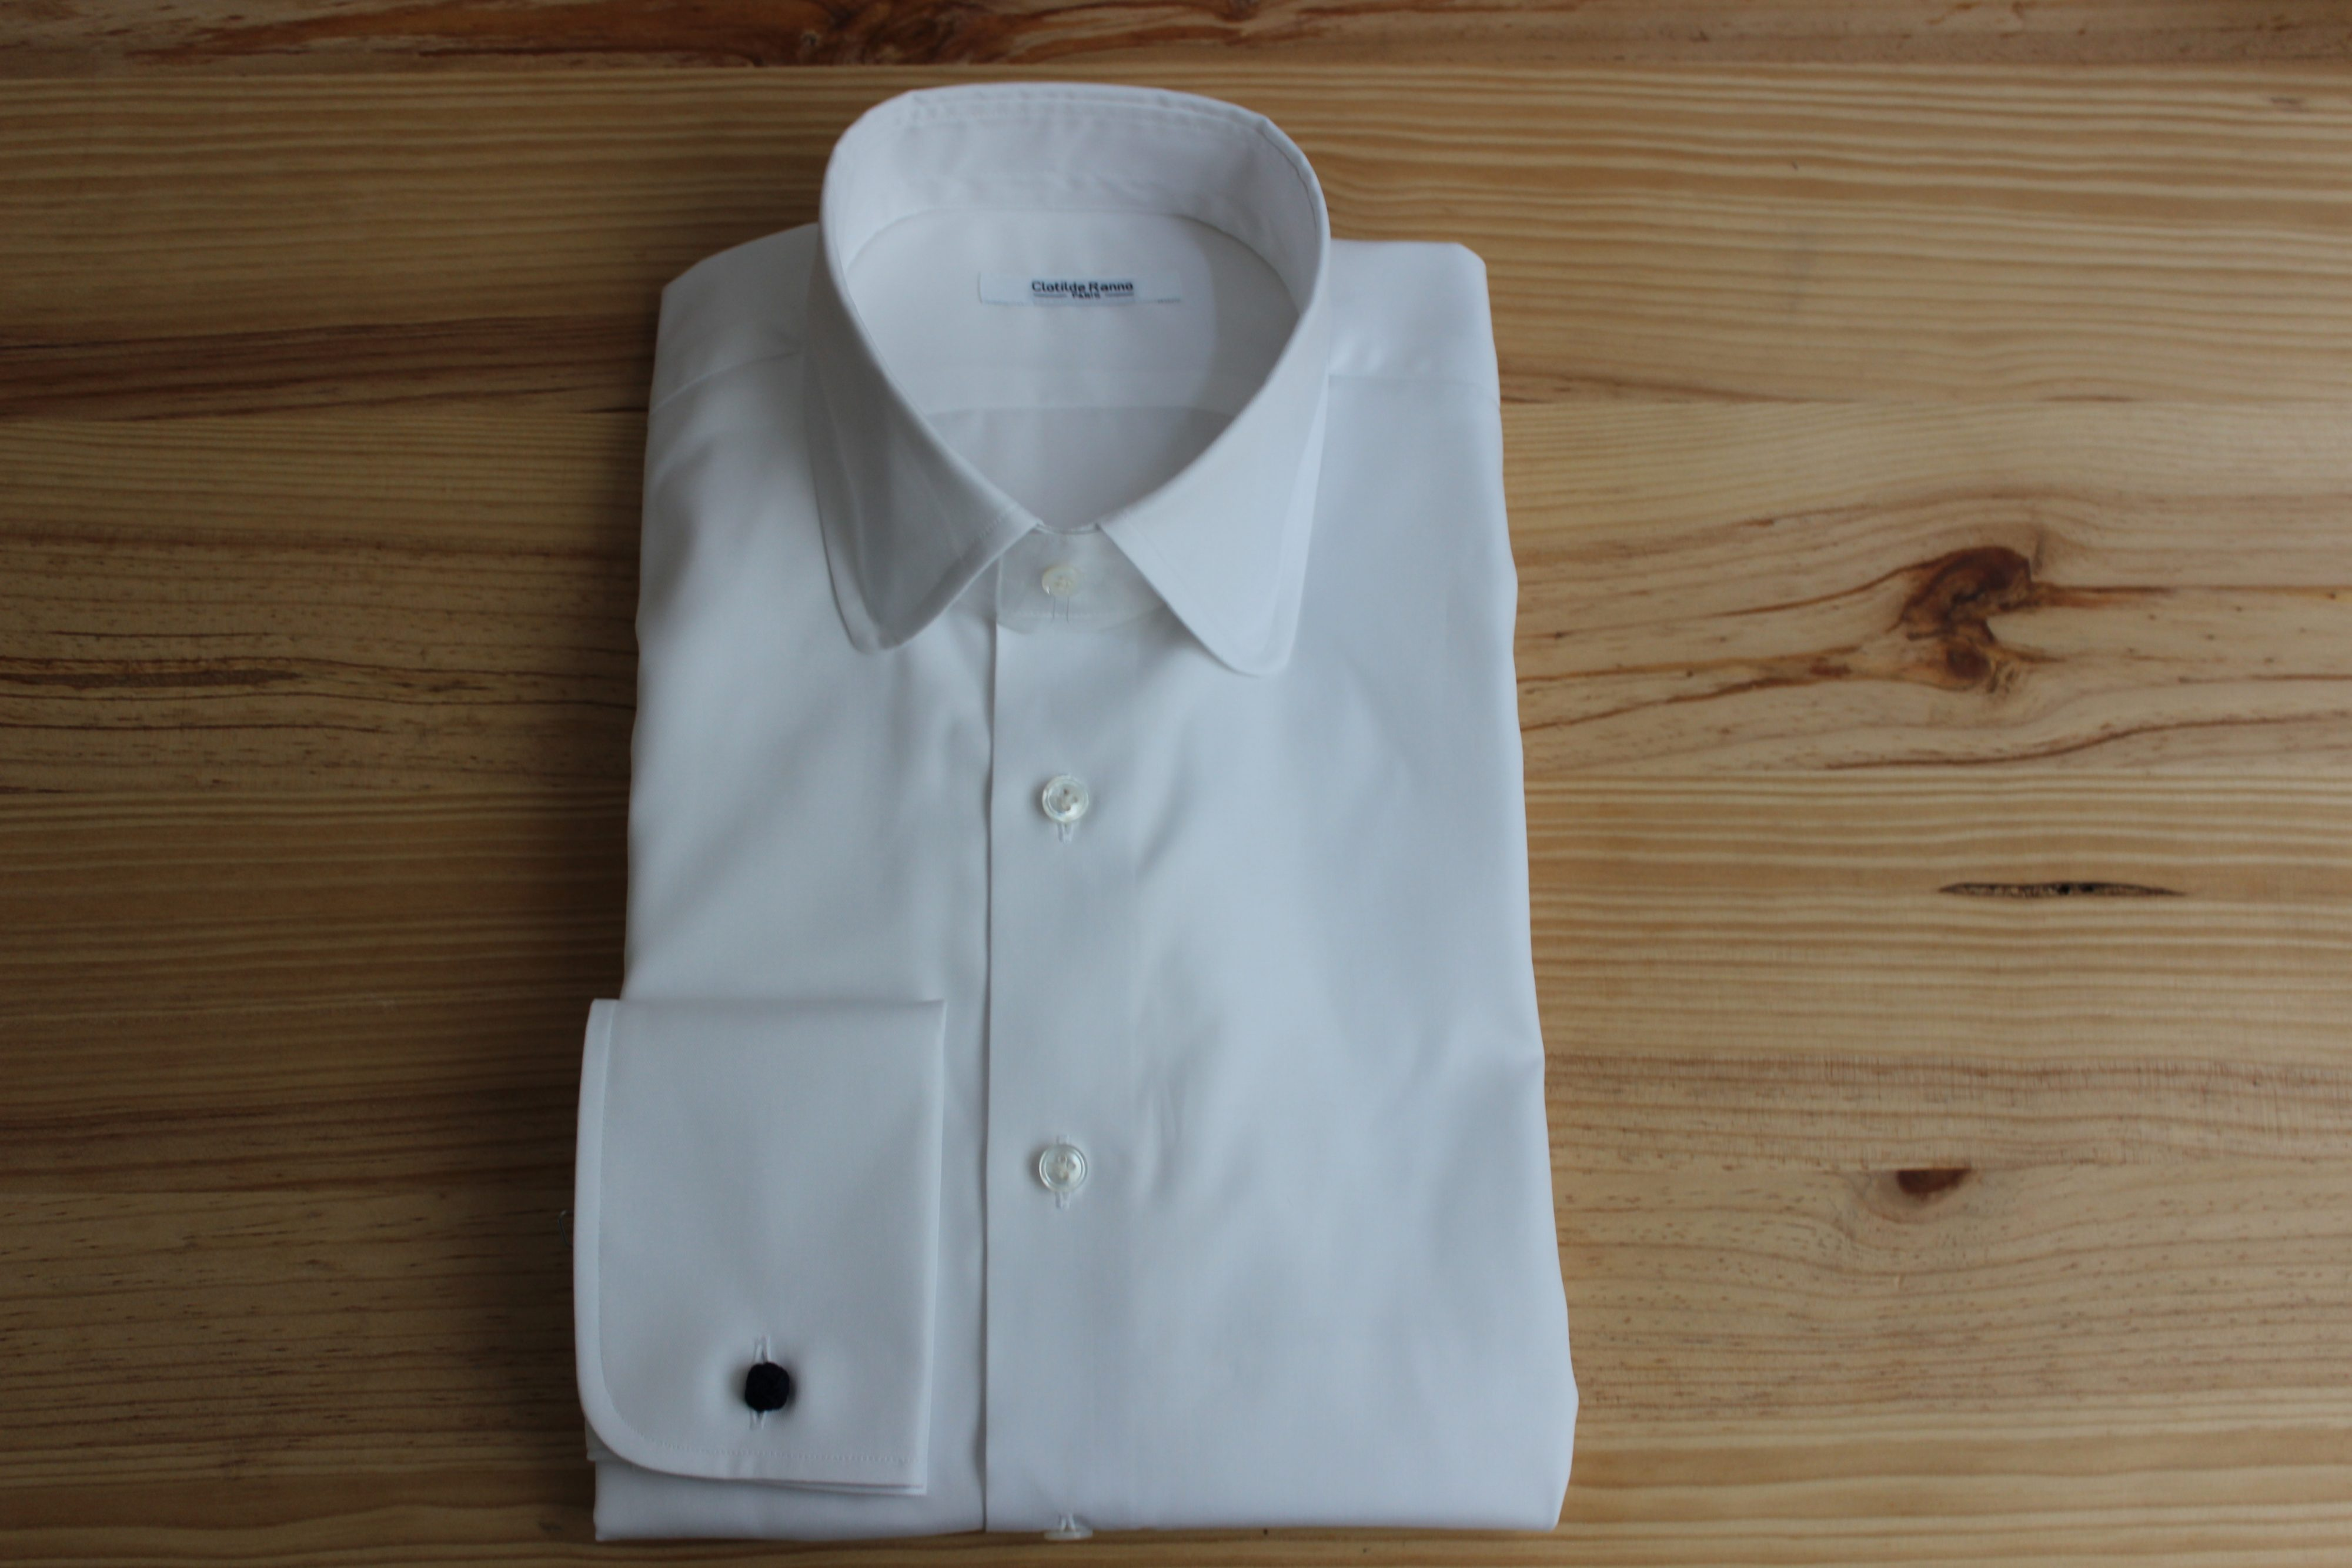 robe chemise sur mesure artisanale , robe chemise sur mesure , robe chemise artisanale